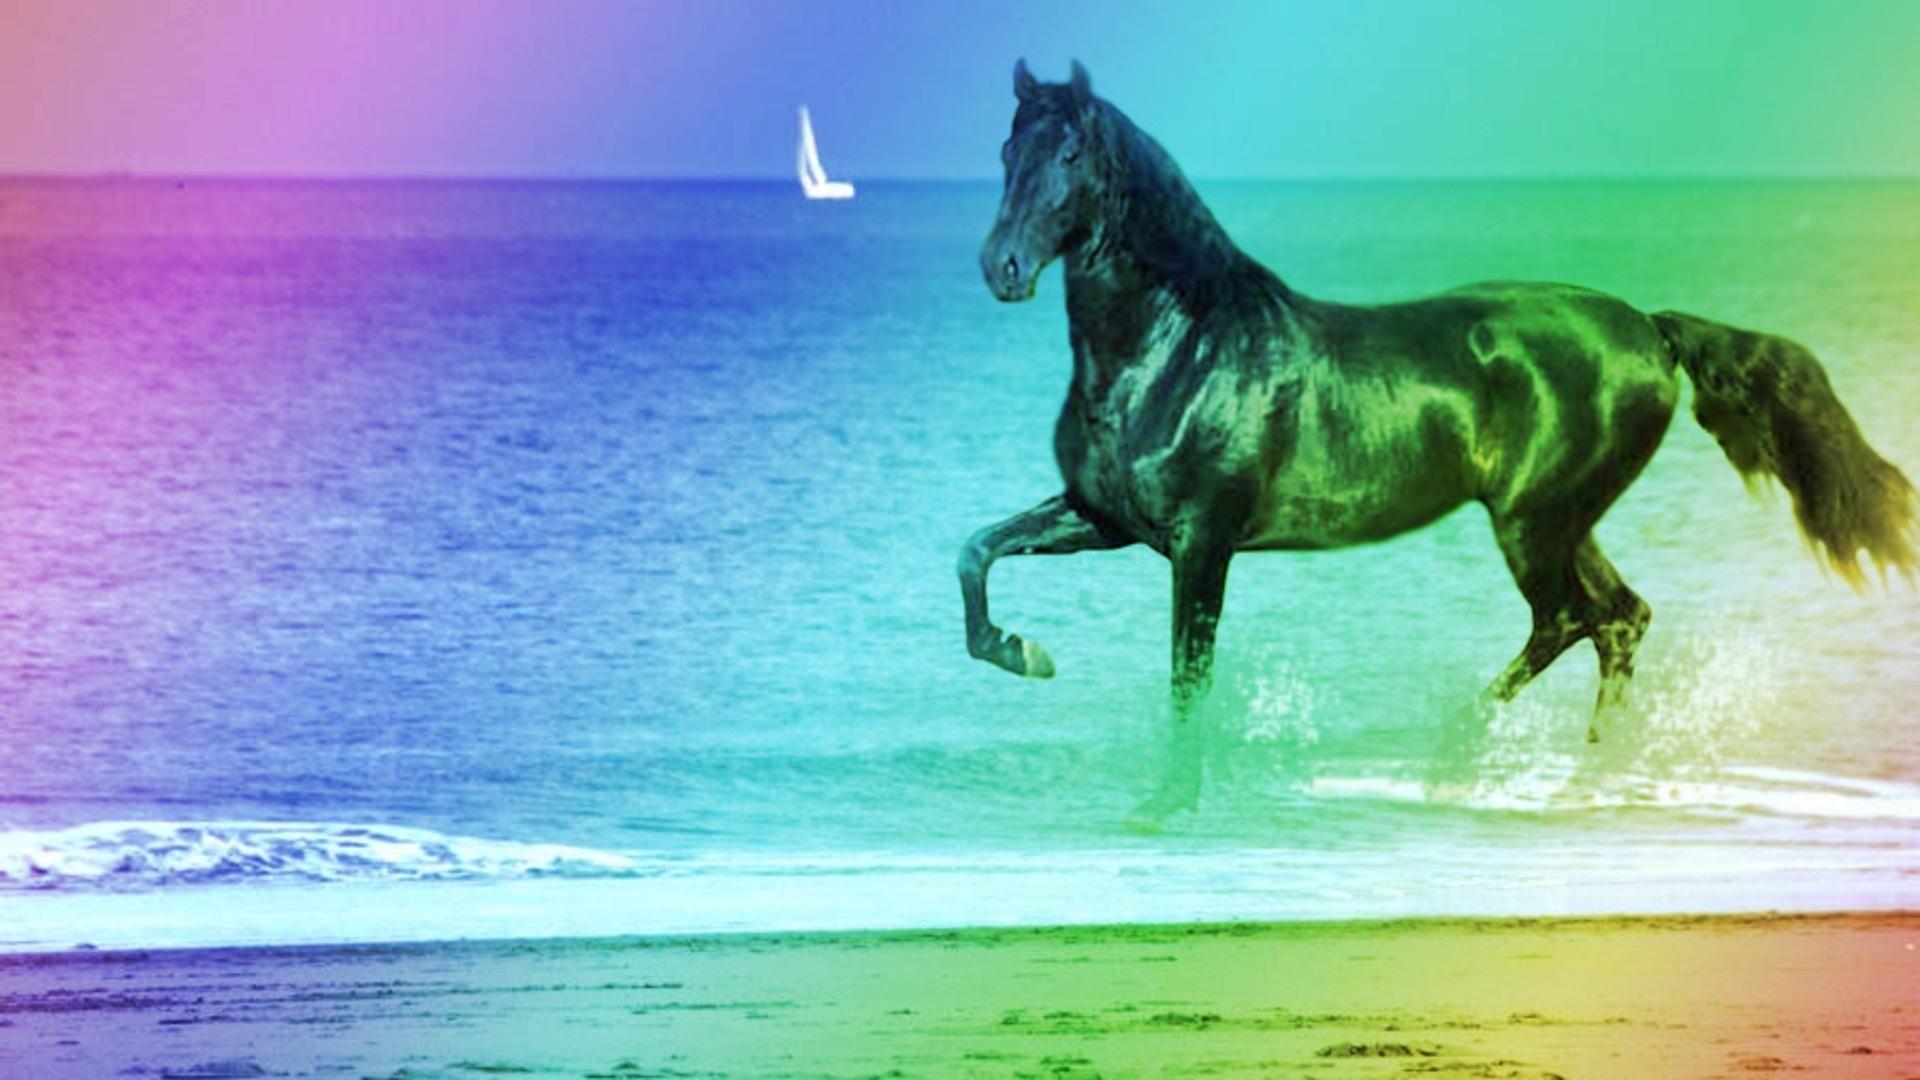 Must see Wallpaper Horse Spirit - 4f8bec3068bfc0339db2c9253c0a9cb3  HD_879888.jpg